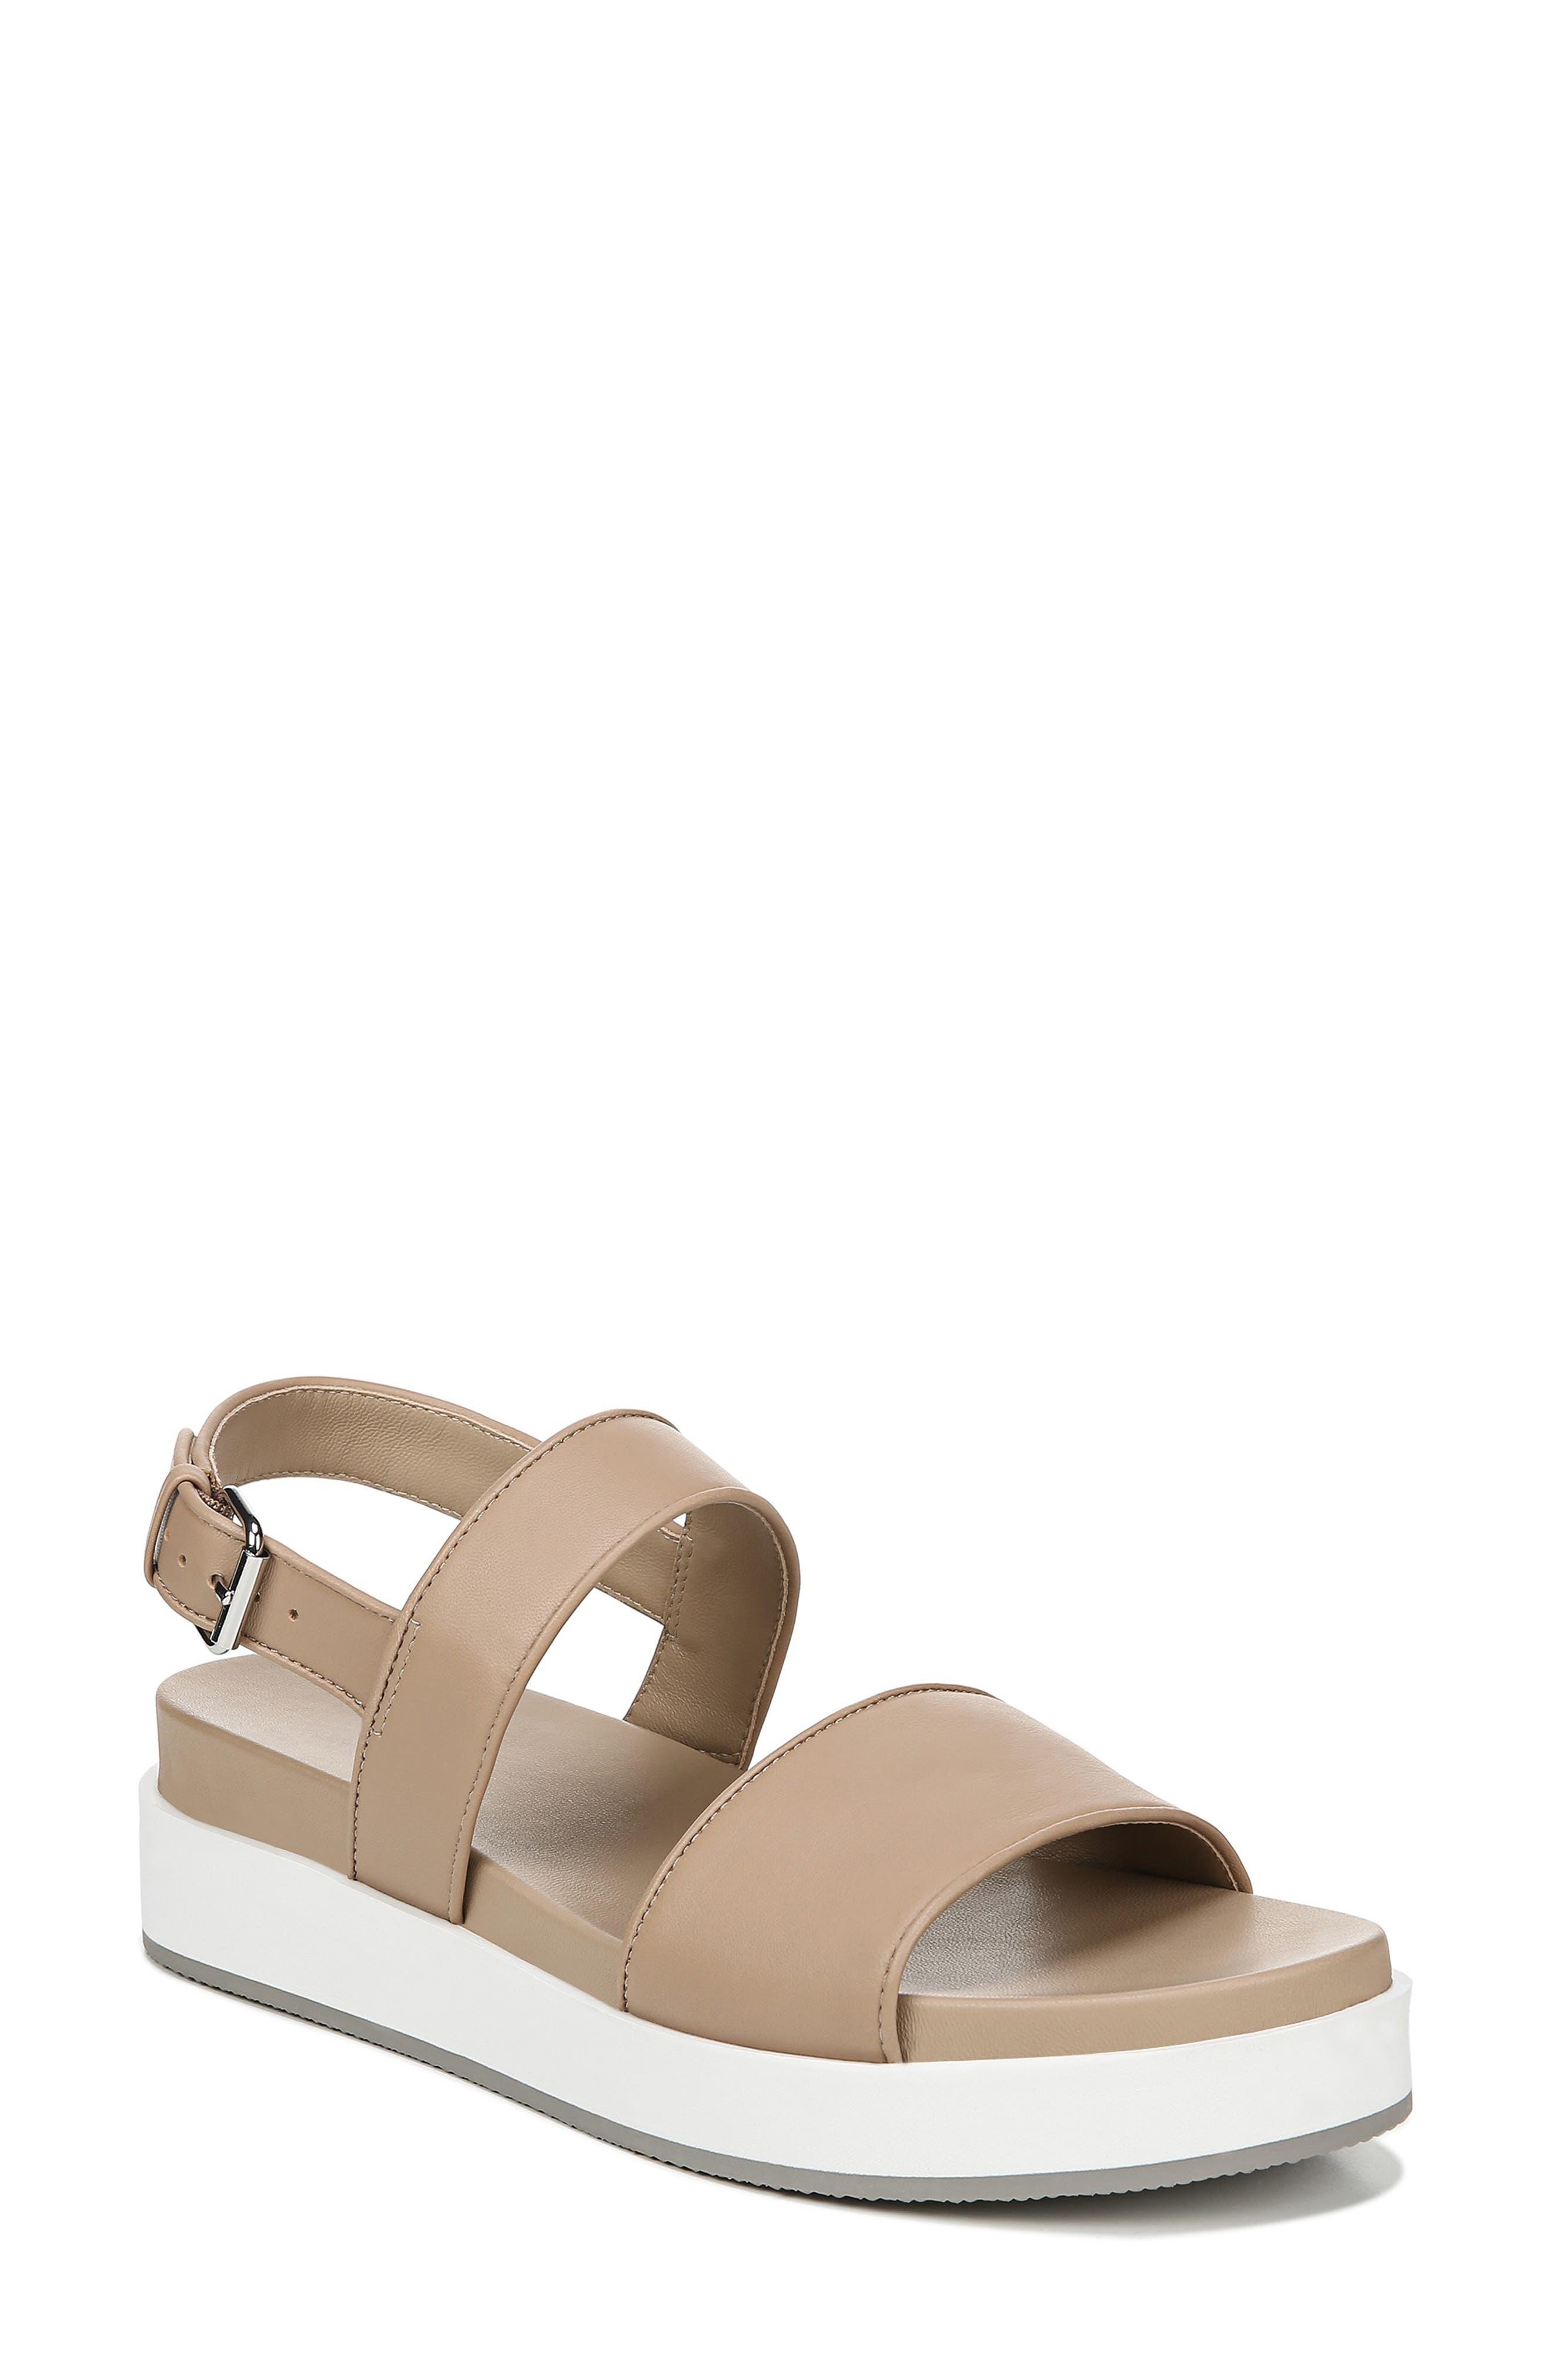 VIA SPIGA Davi Platform Sandal, Main, color, DESERT NAPPA